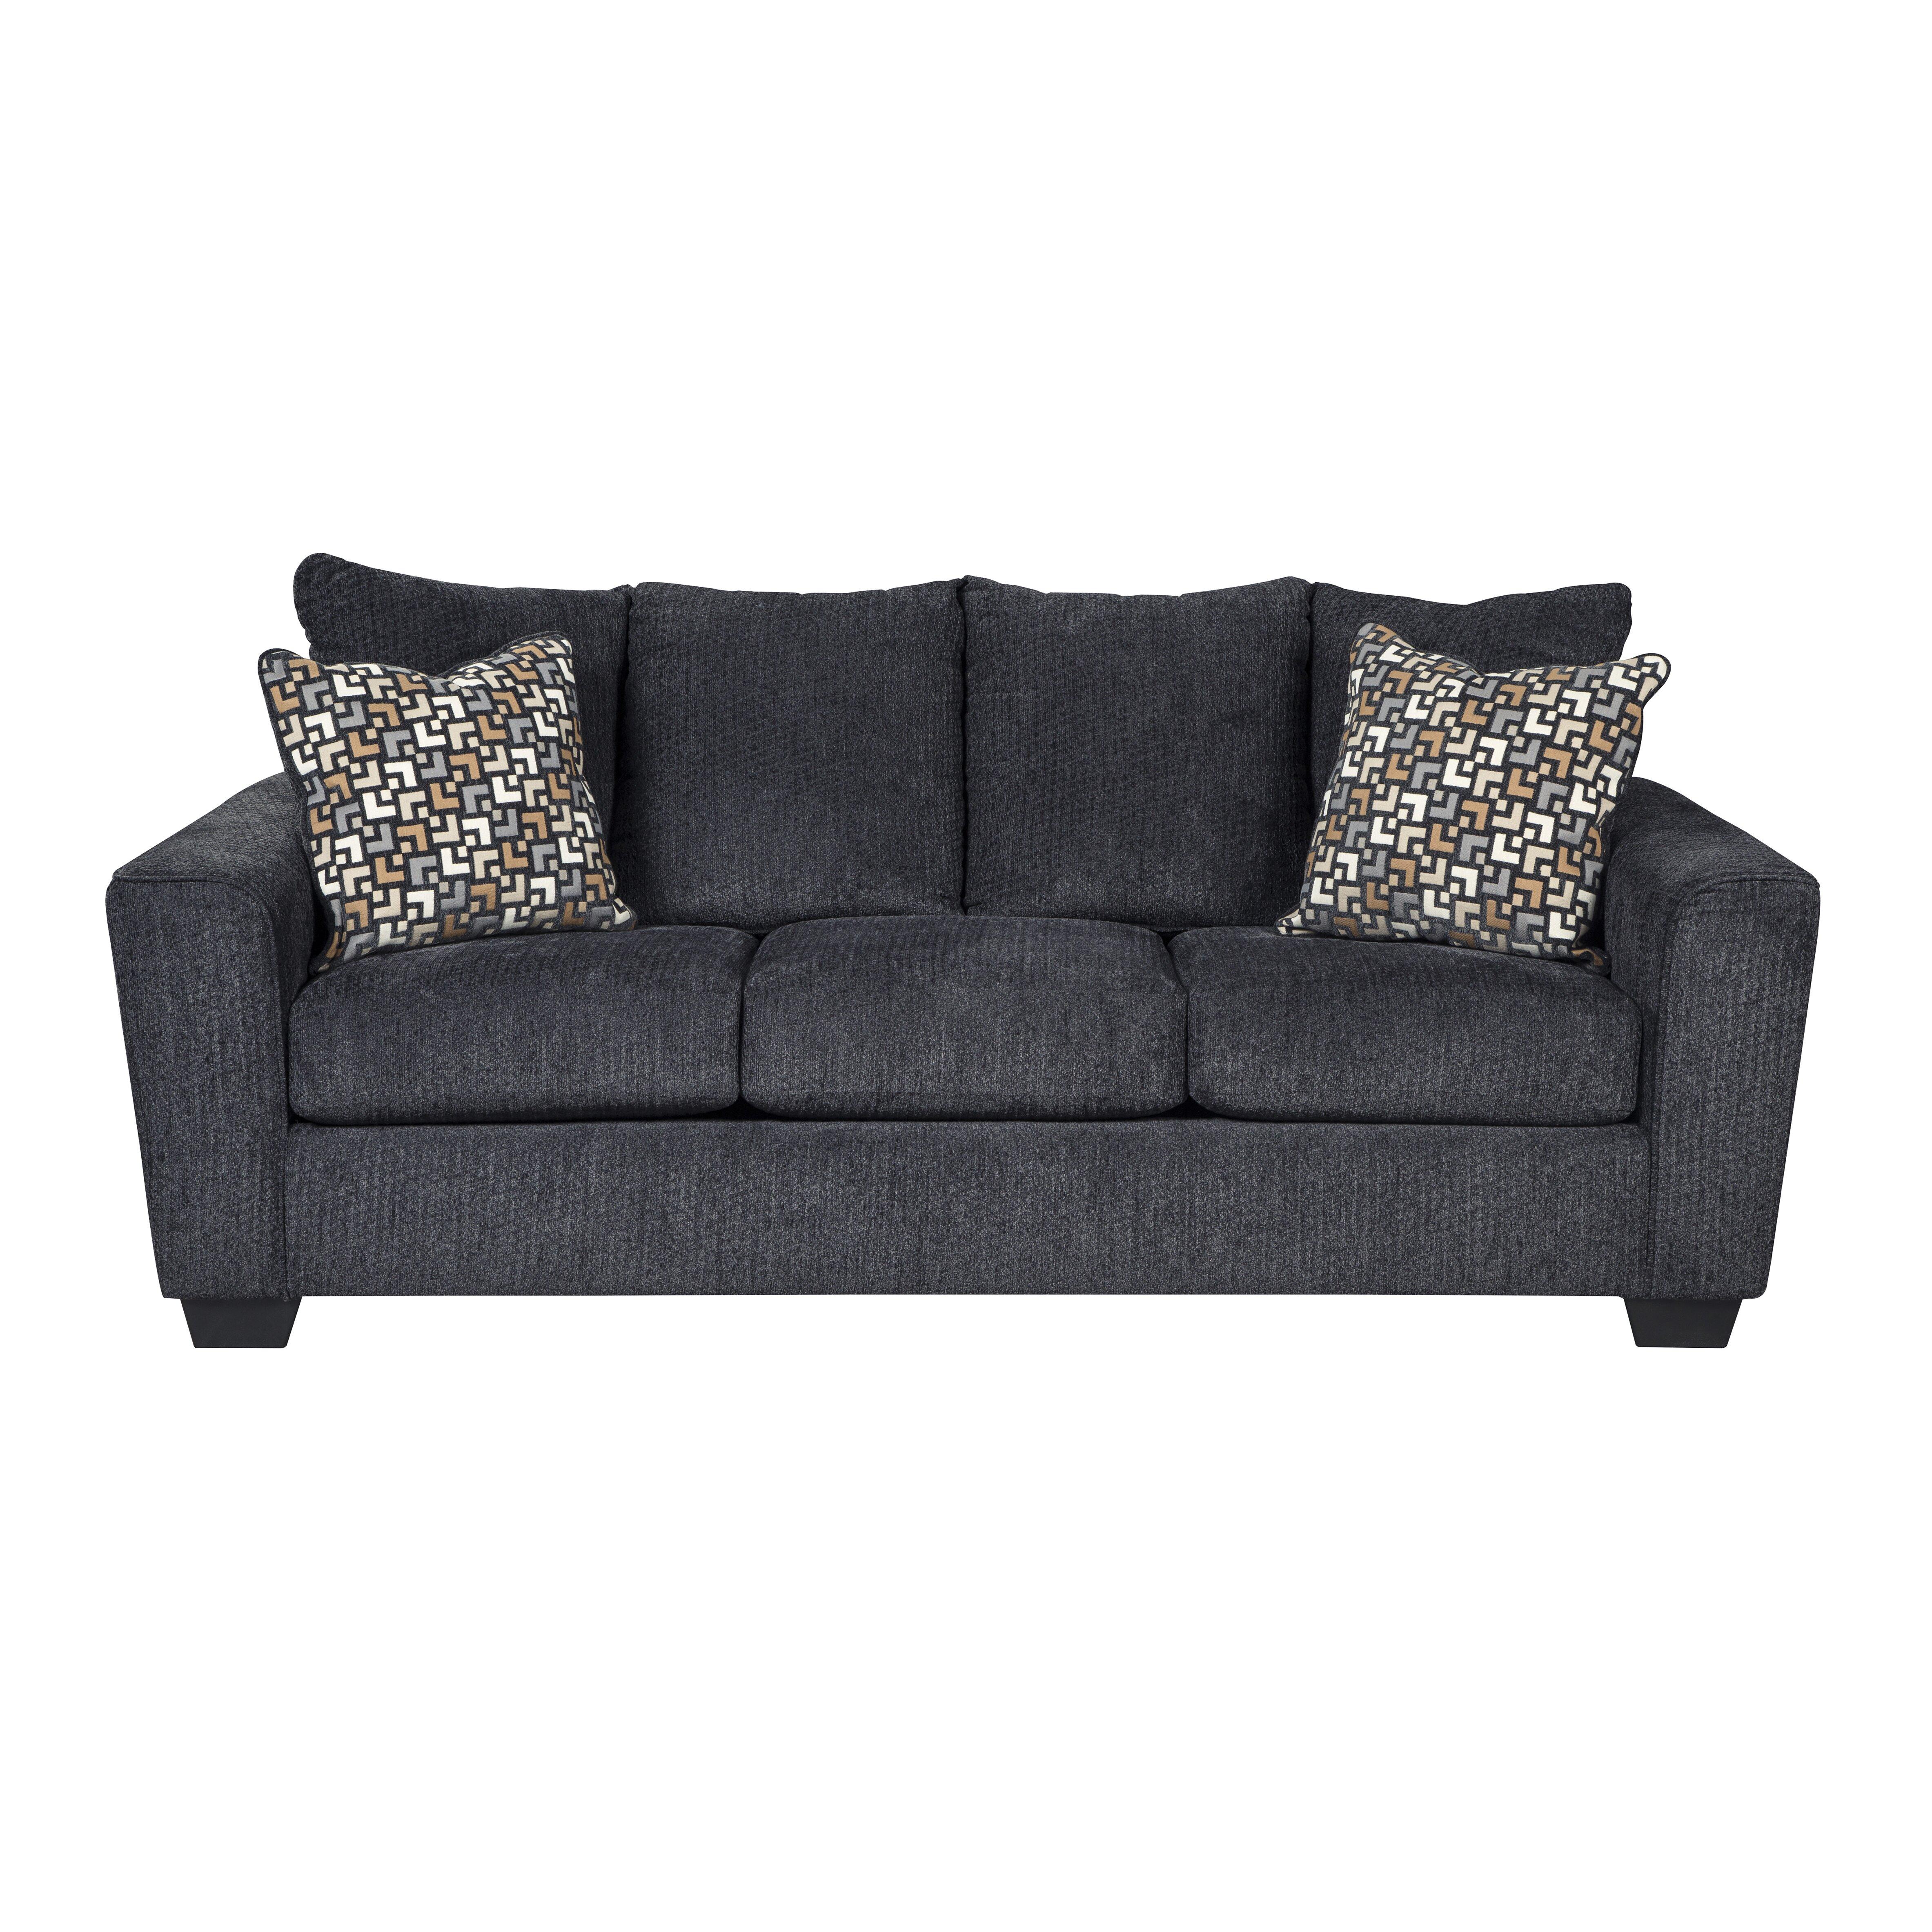 Benchcraft Wixon Sofa Reviews